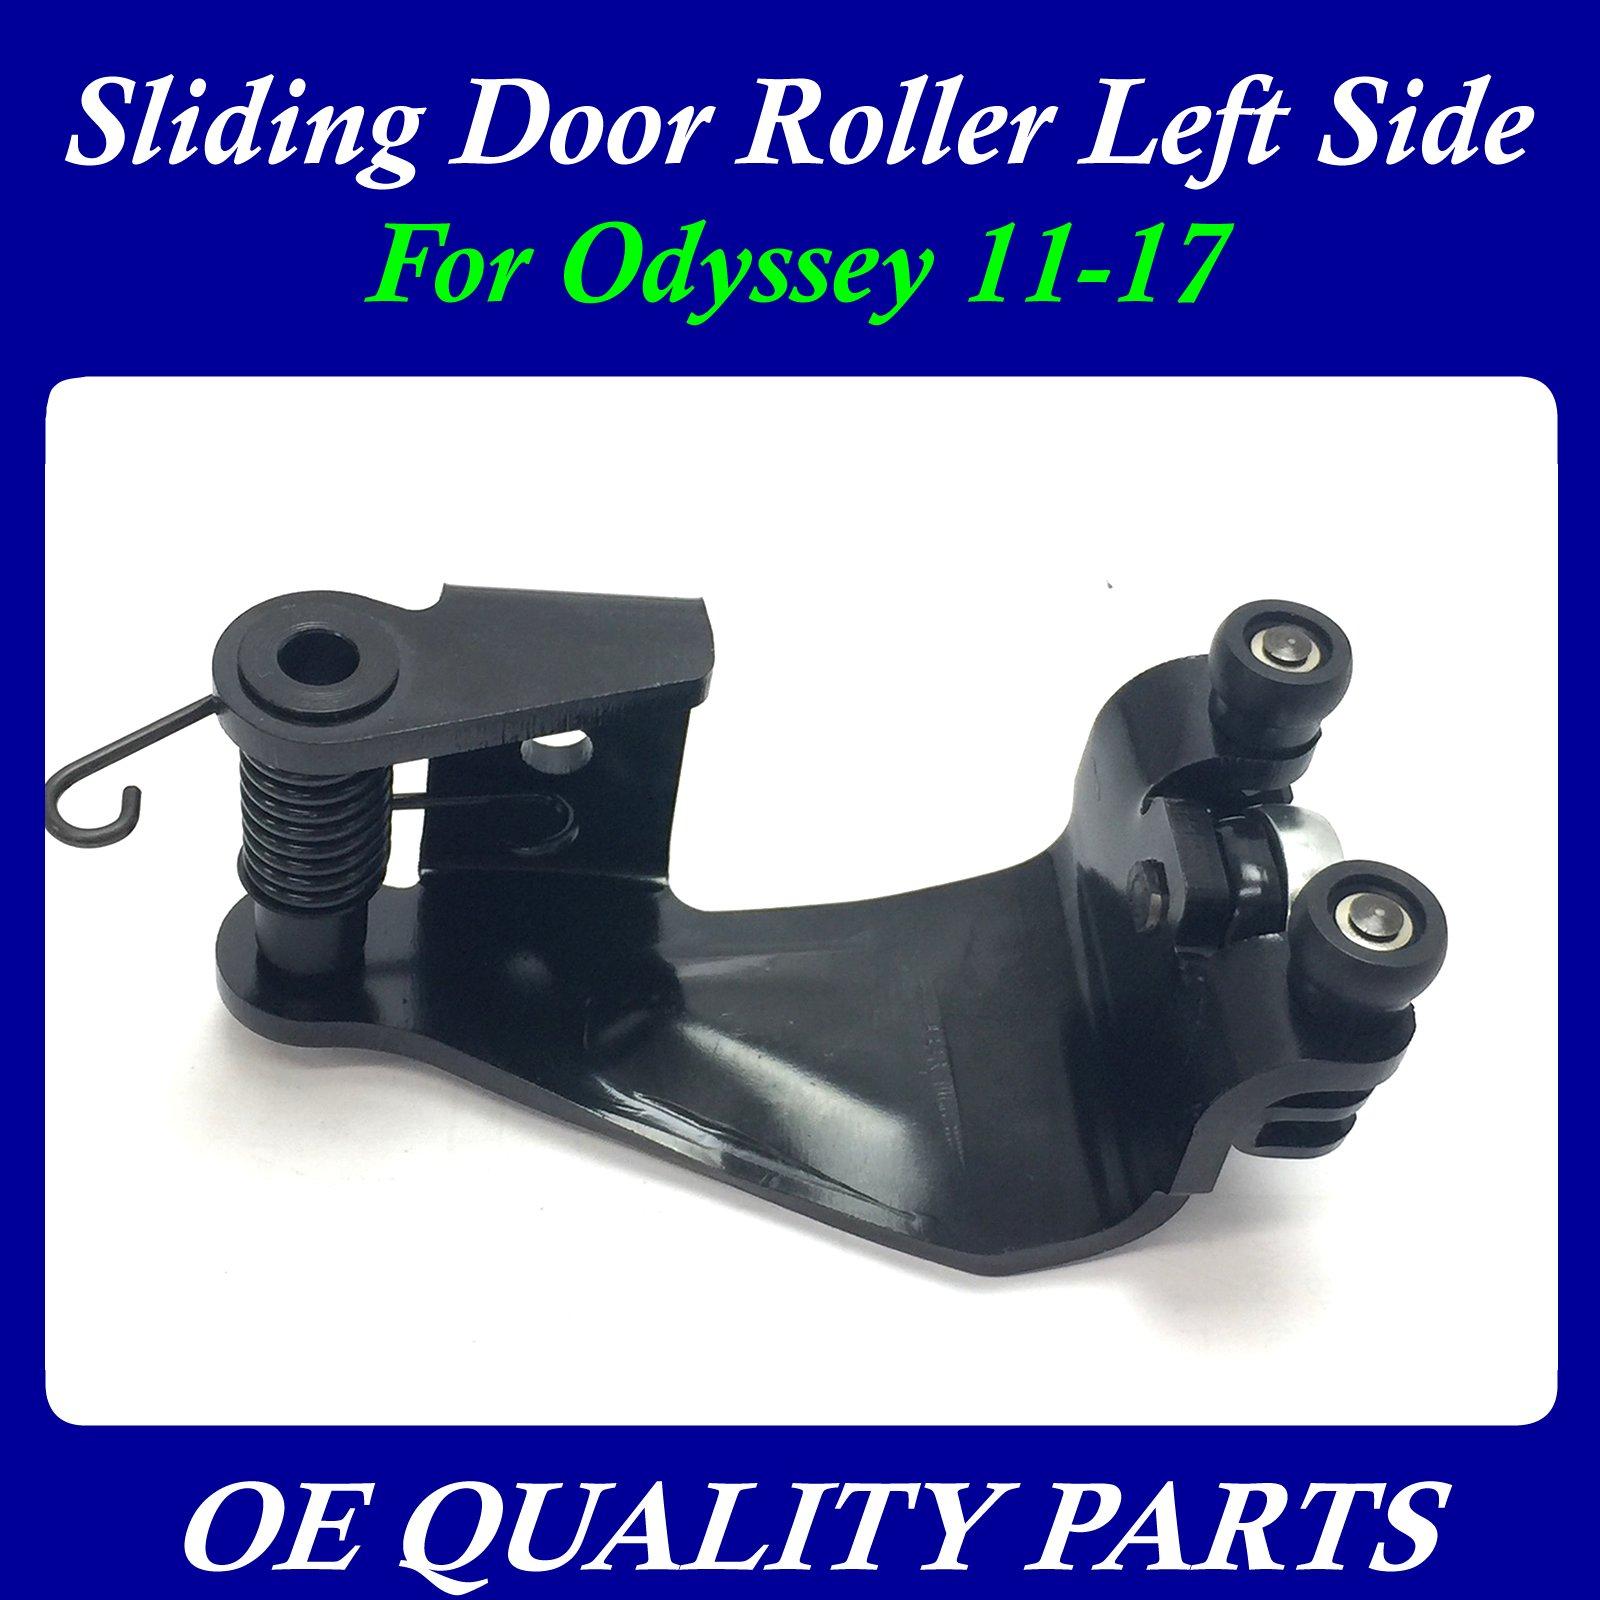 Power Sliding Door Roller Hinge RH Right Side for Odyssey 11-17 72521TK8A11